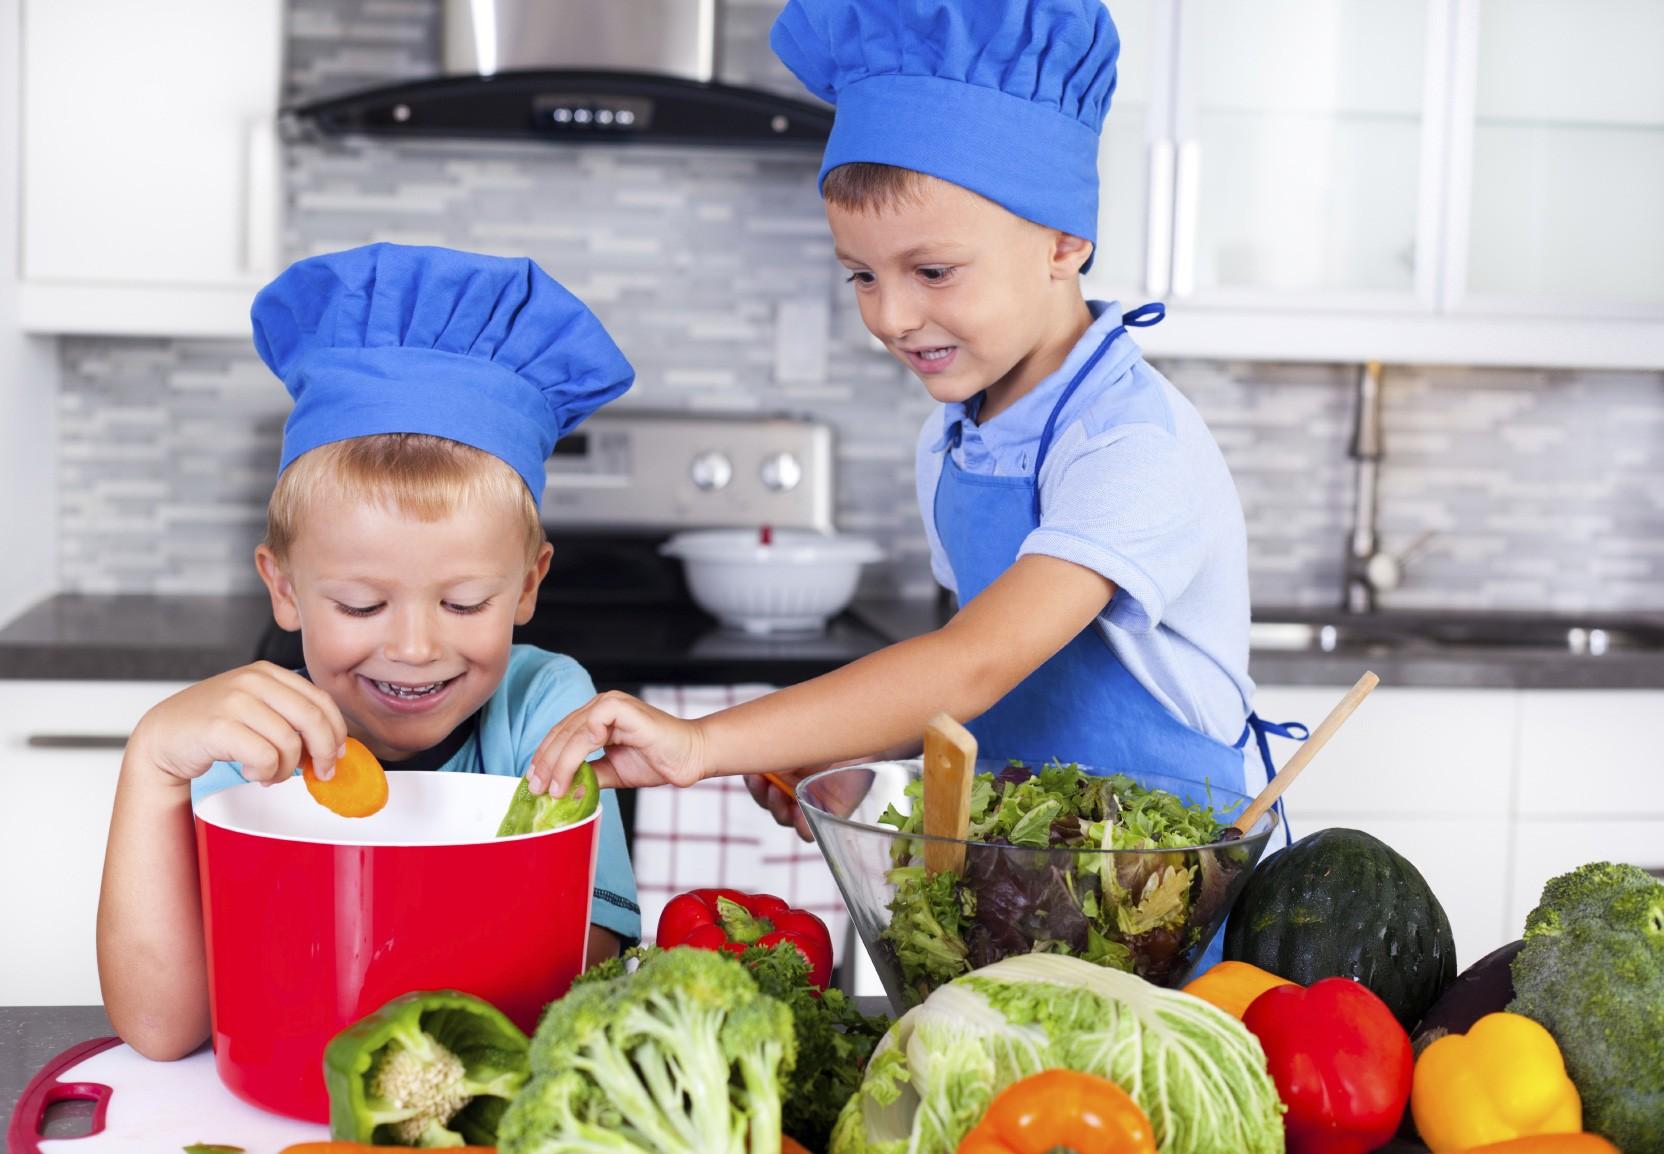 Kids Cooking Vegetables